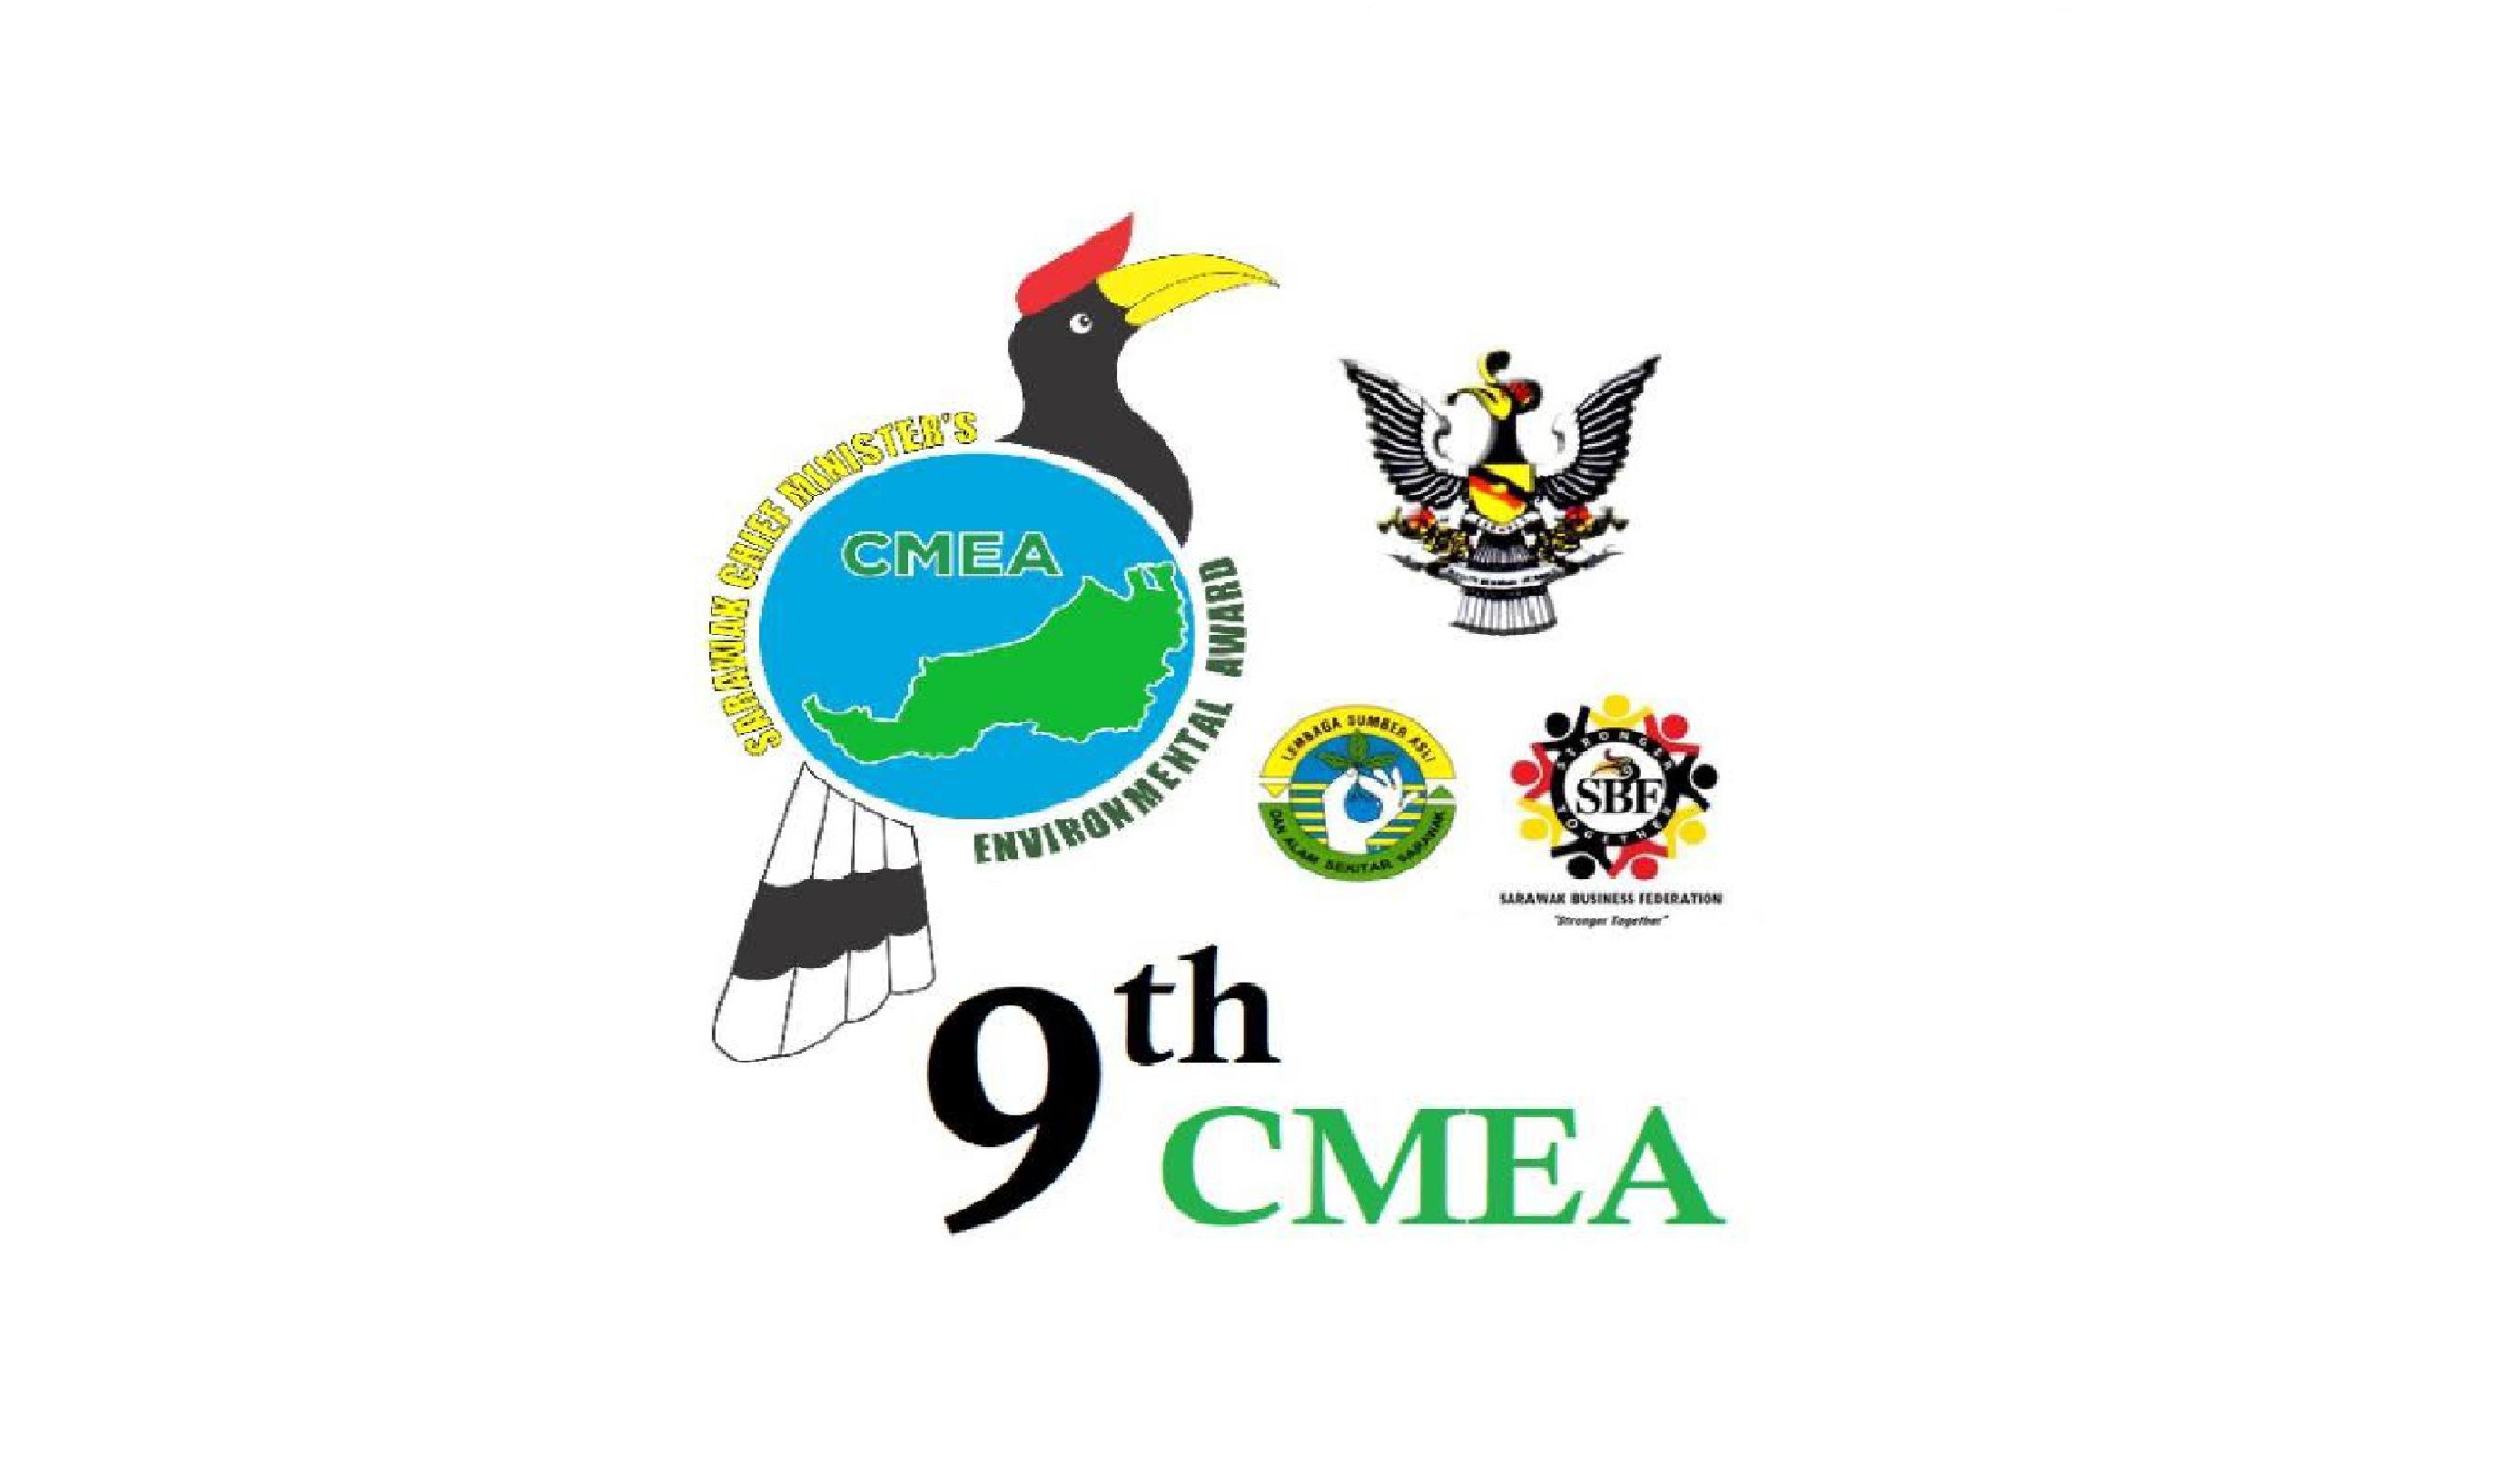 CMEA 2020 focuses on environmental stewardship